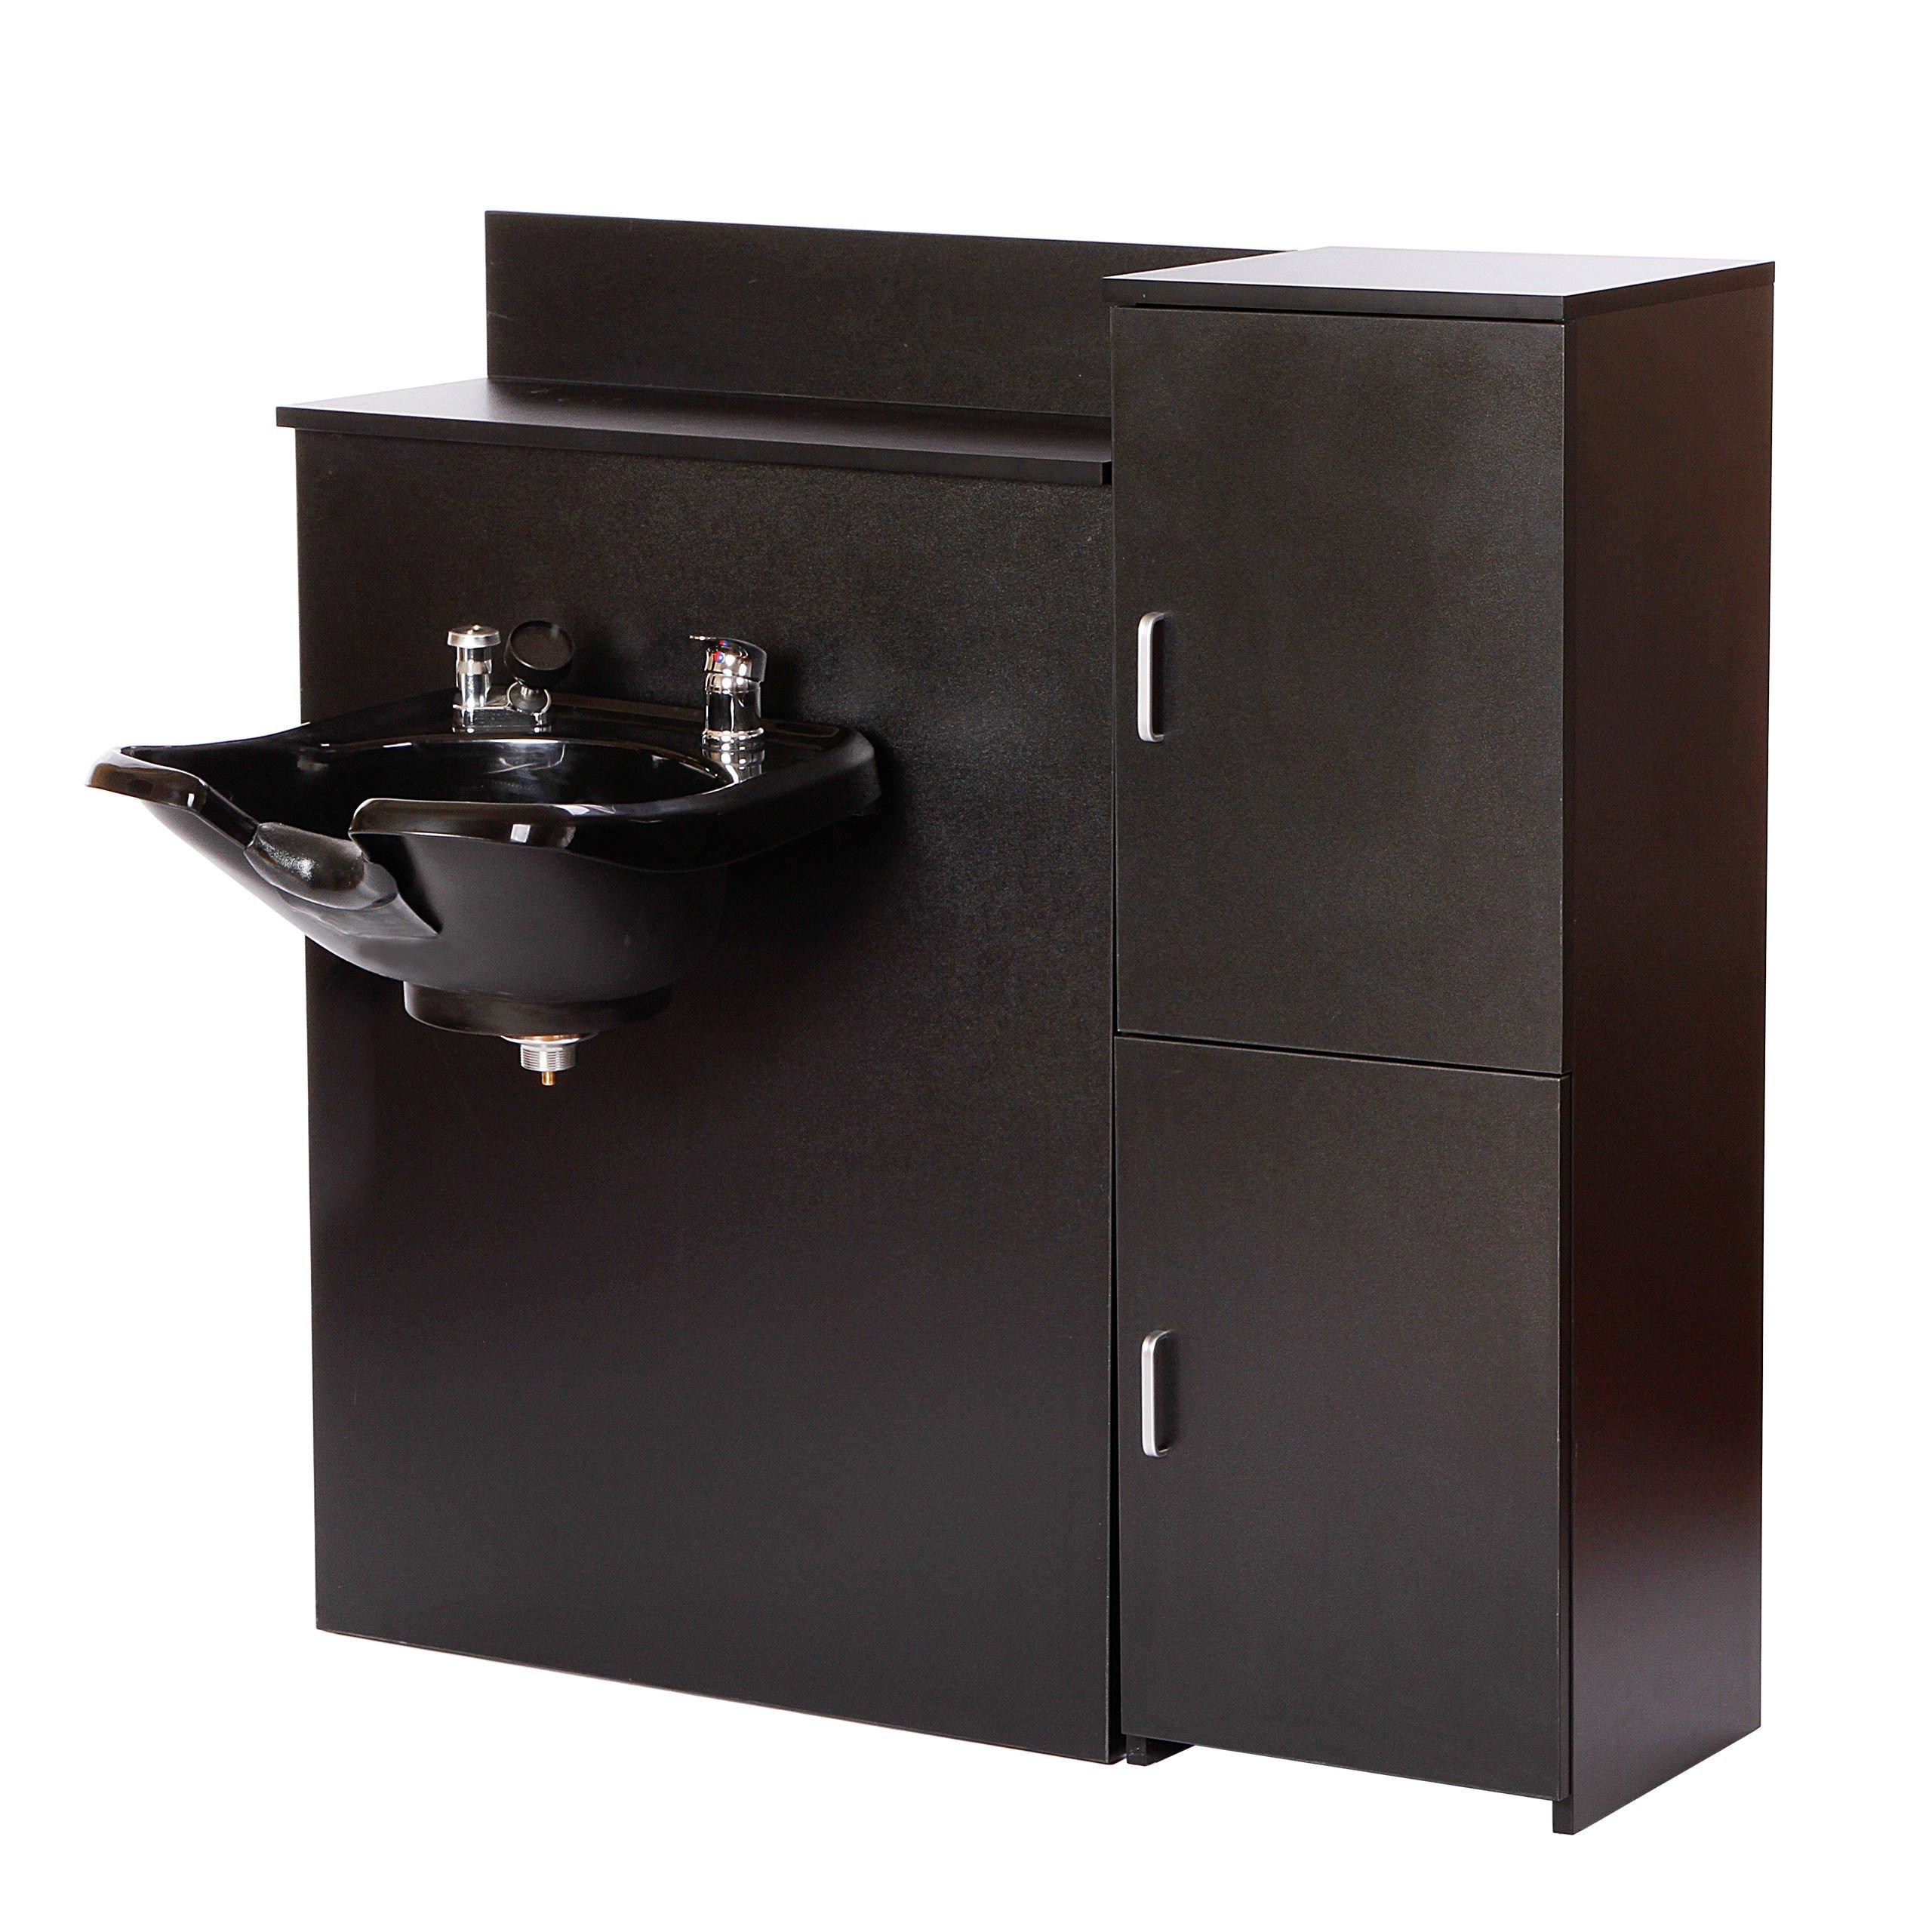 Beauty Salon Backwash Shampoo Bowl with Floor Cabinet & Shelves for MAXIMUM Storage